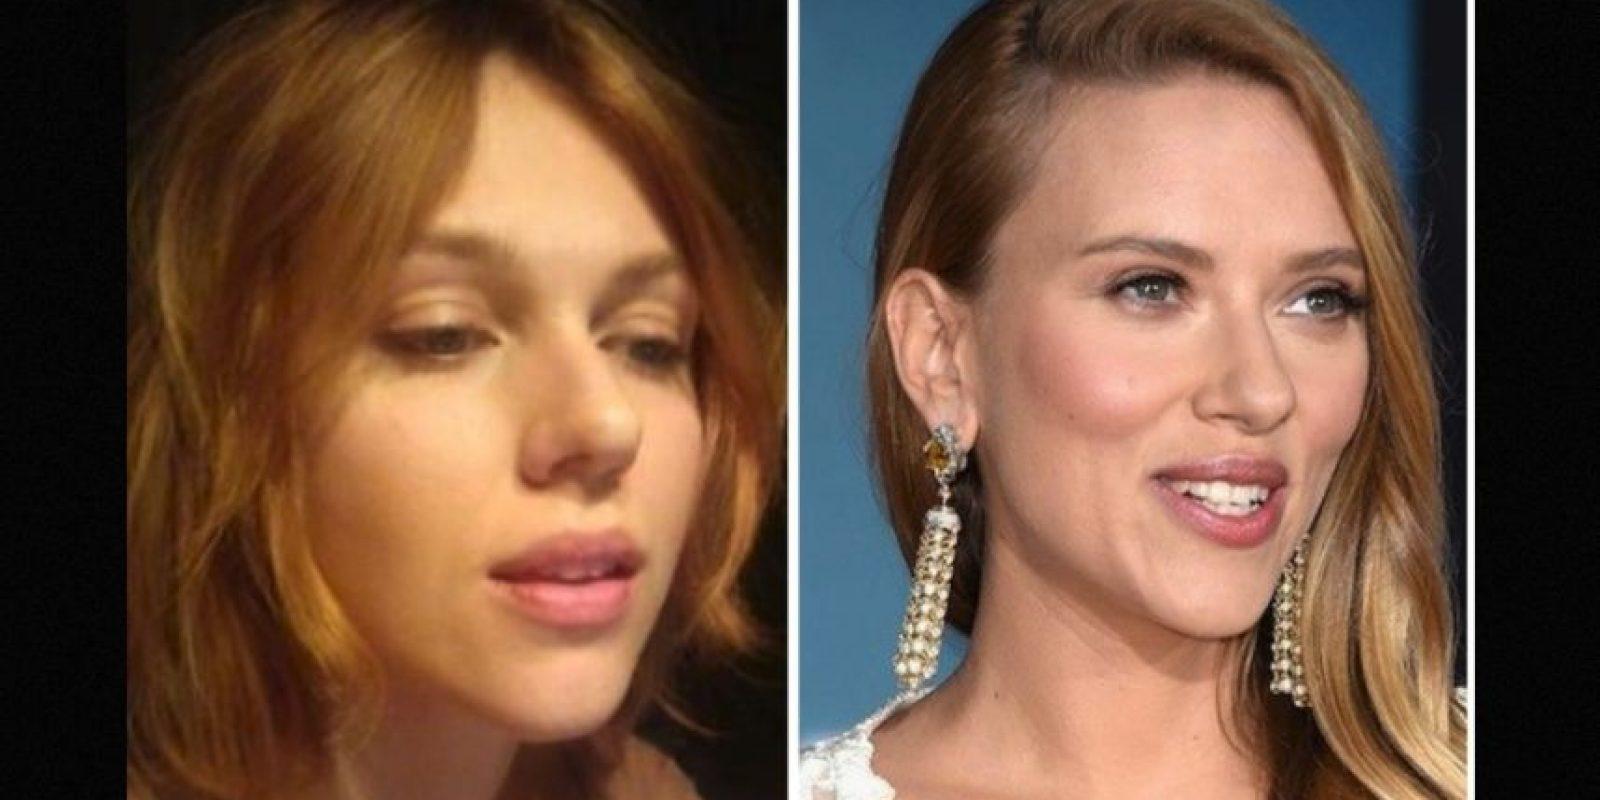 Igual a Scarlett Johansson Foto:Reddit/Getty